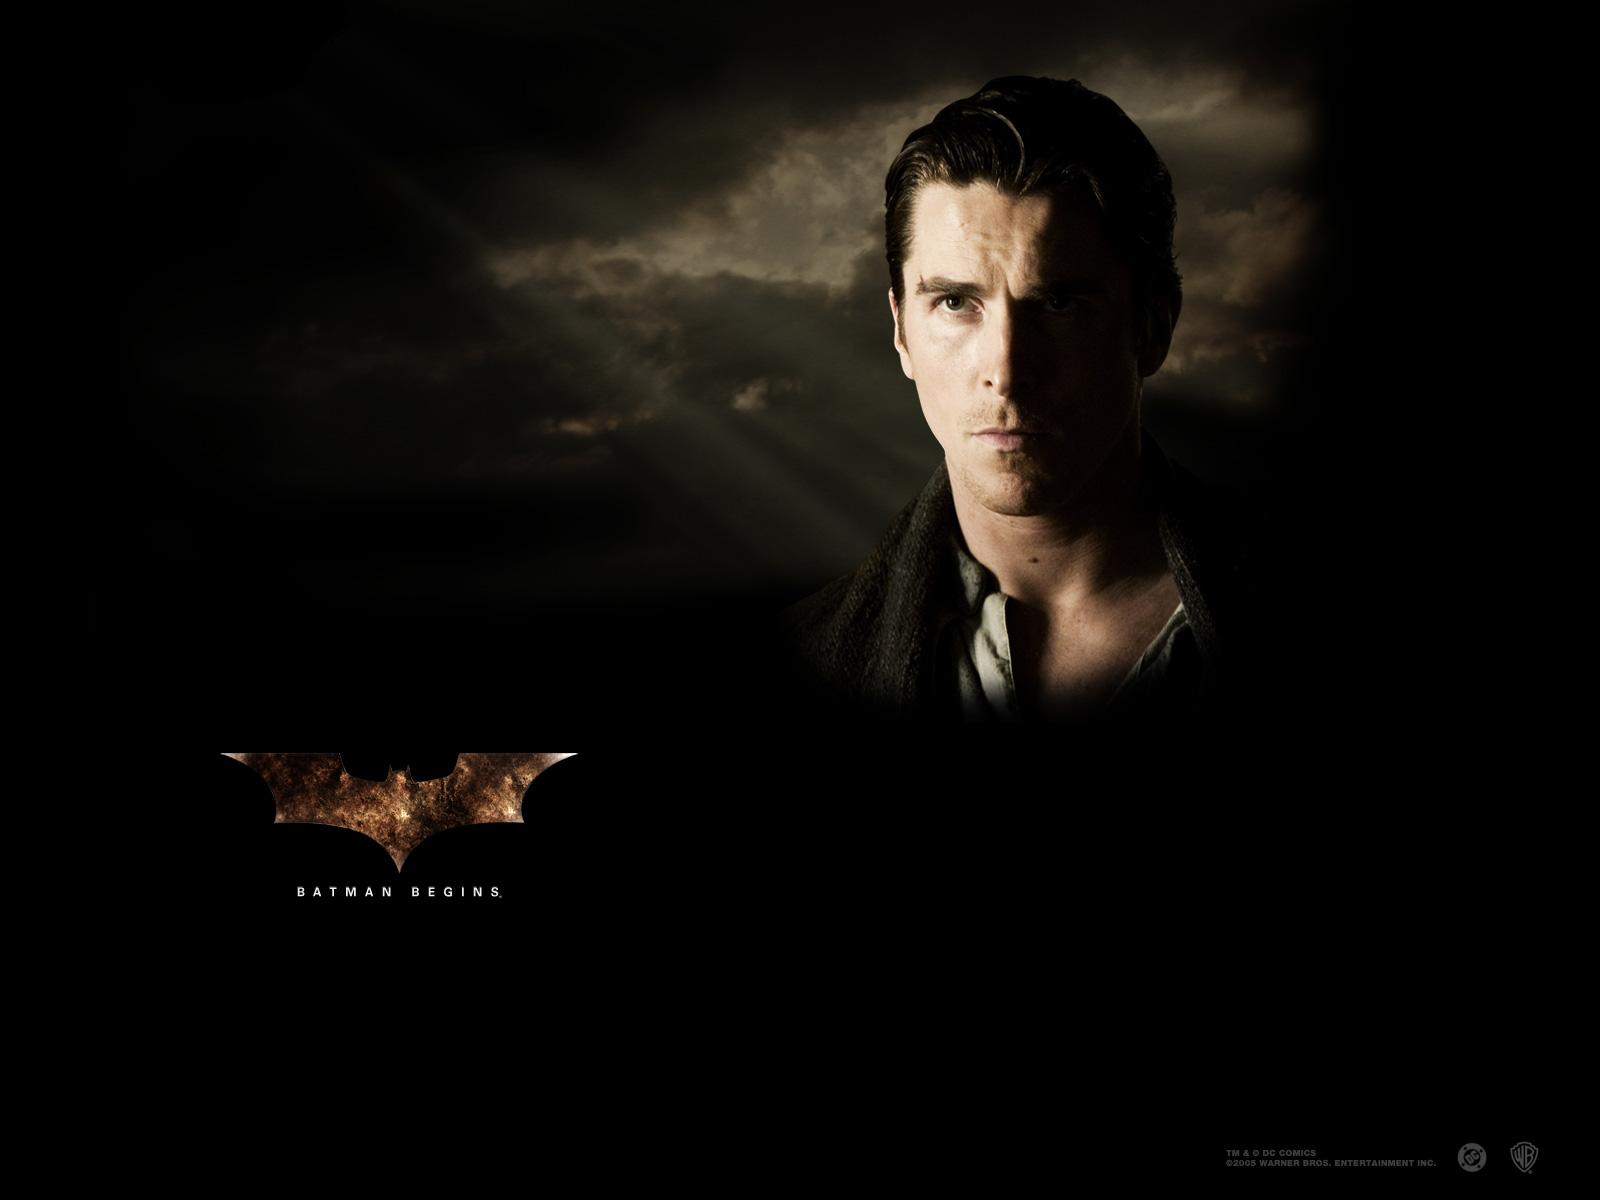 Wallpaper Bruce Wayne Batman begins